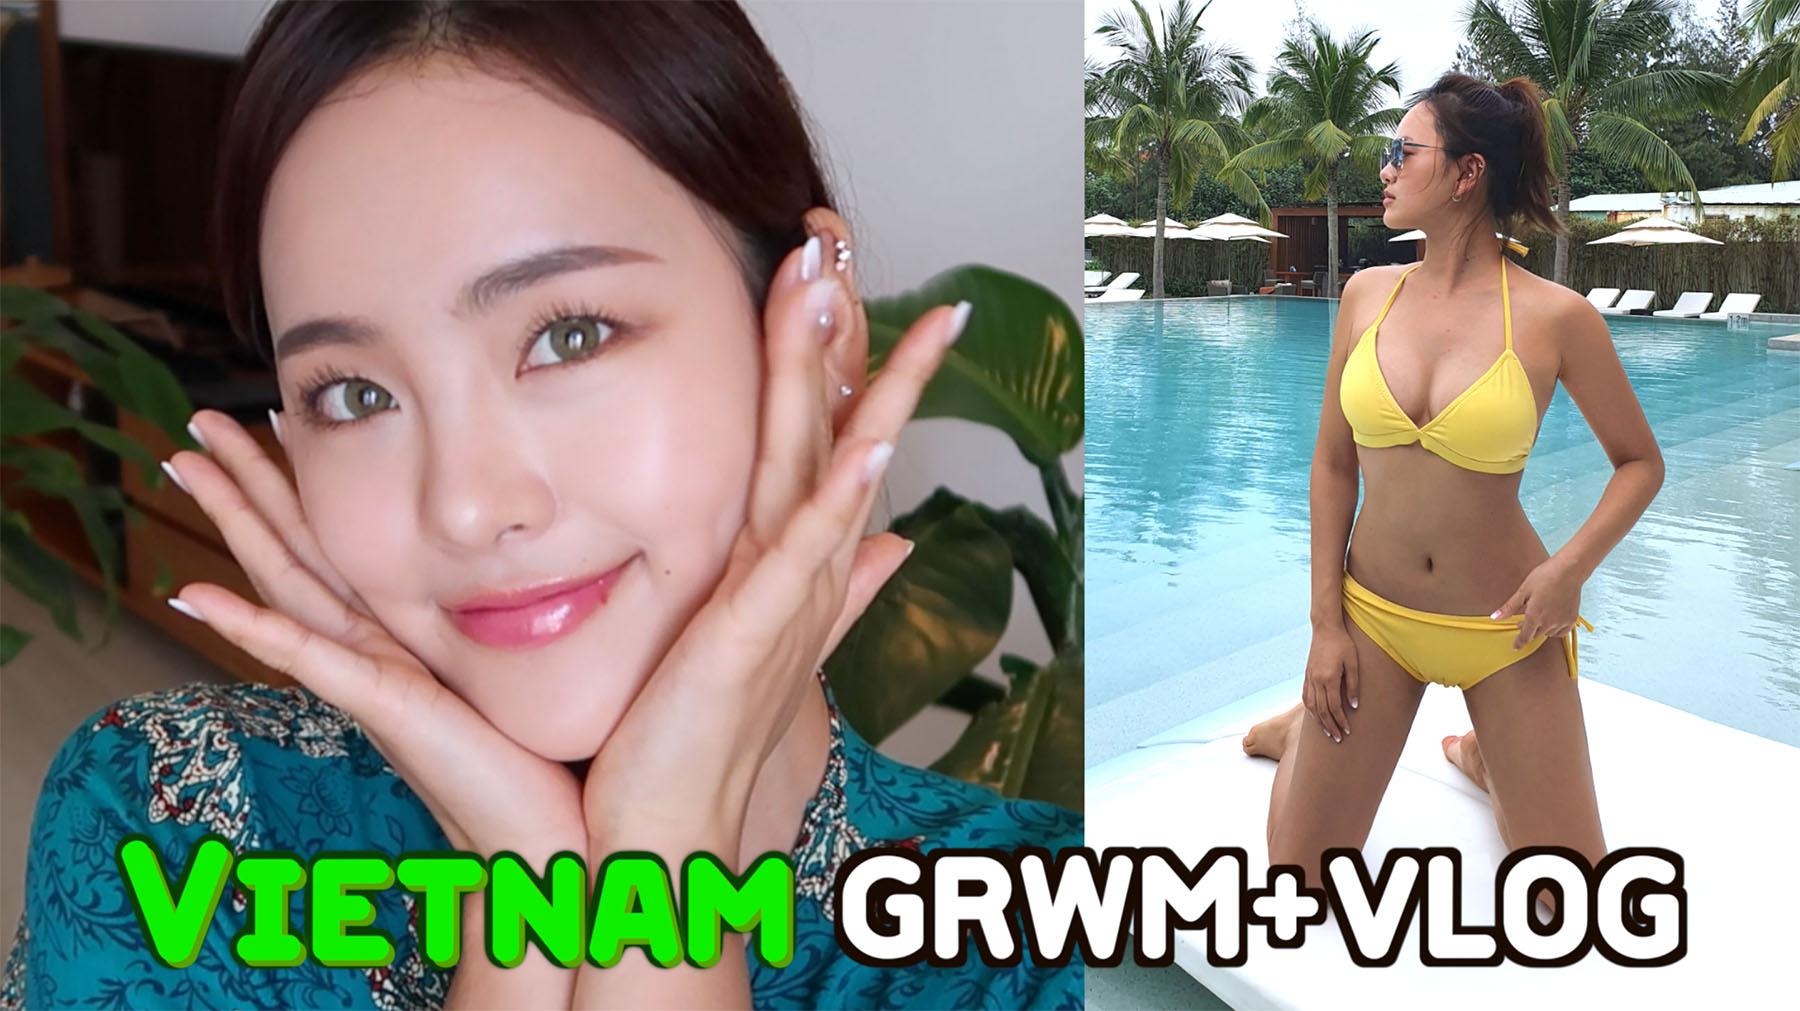 [Vietnam GRWM+VLOG] 베트남에서 같이 준비해요♥ 꾸안꾸 메이크업!